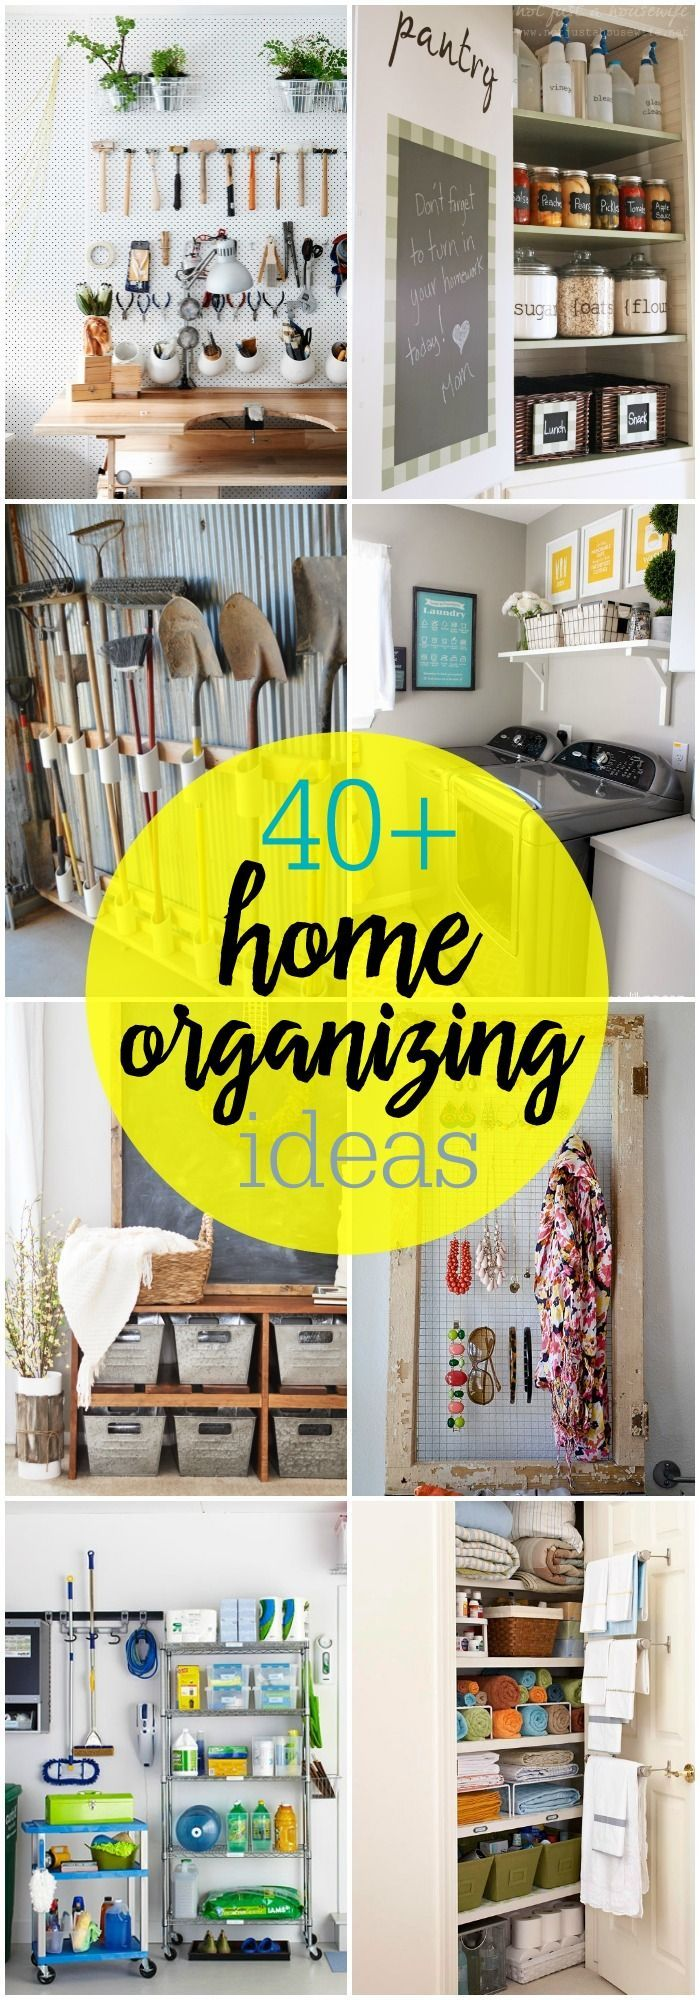 Home Organization Ideas | pins i love :) | Pinterest | Organisation ...